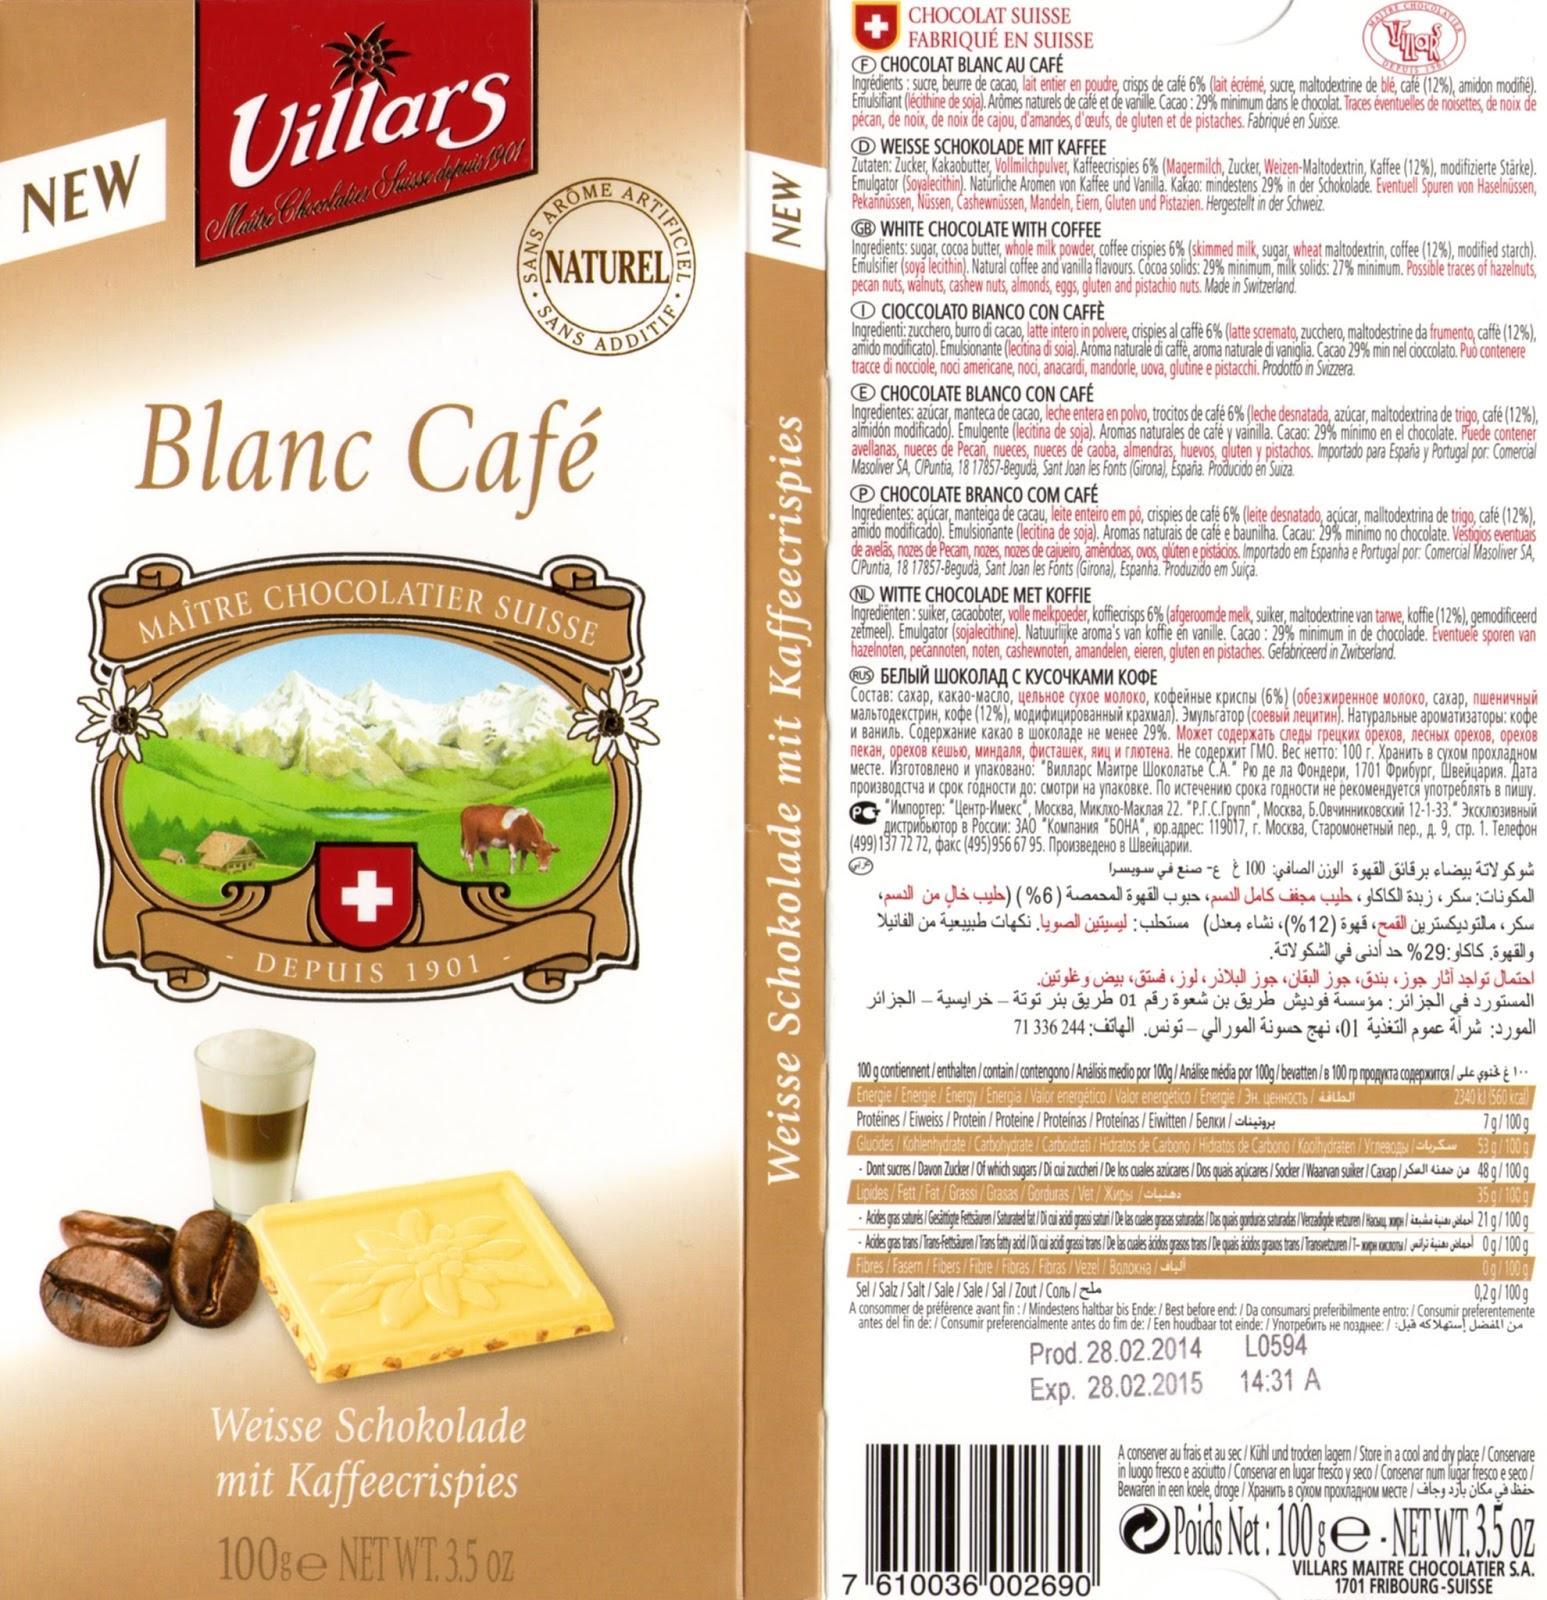 tablette de chocolat blanc gourmand villars blanc café